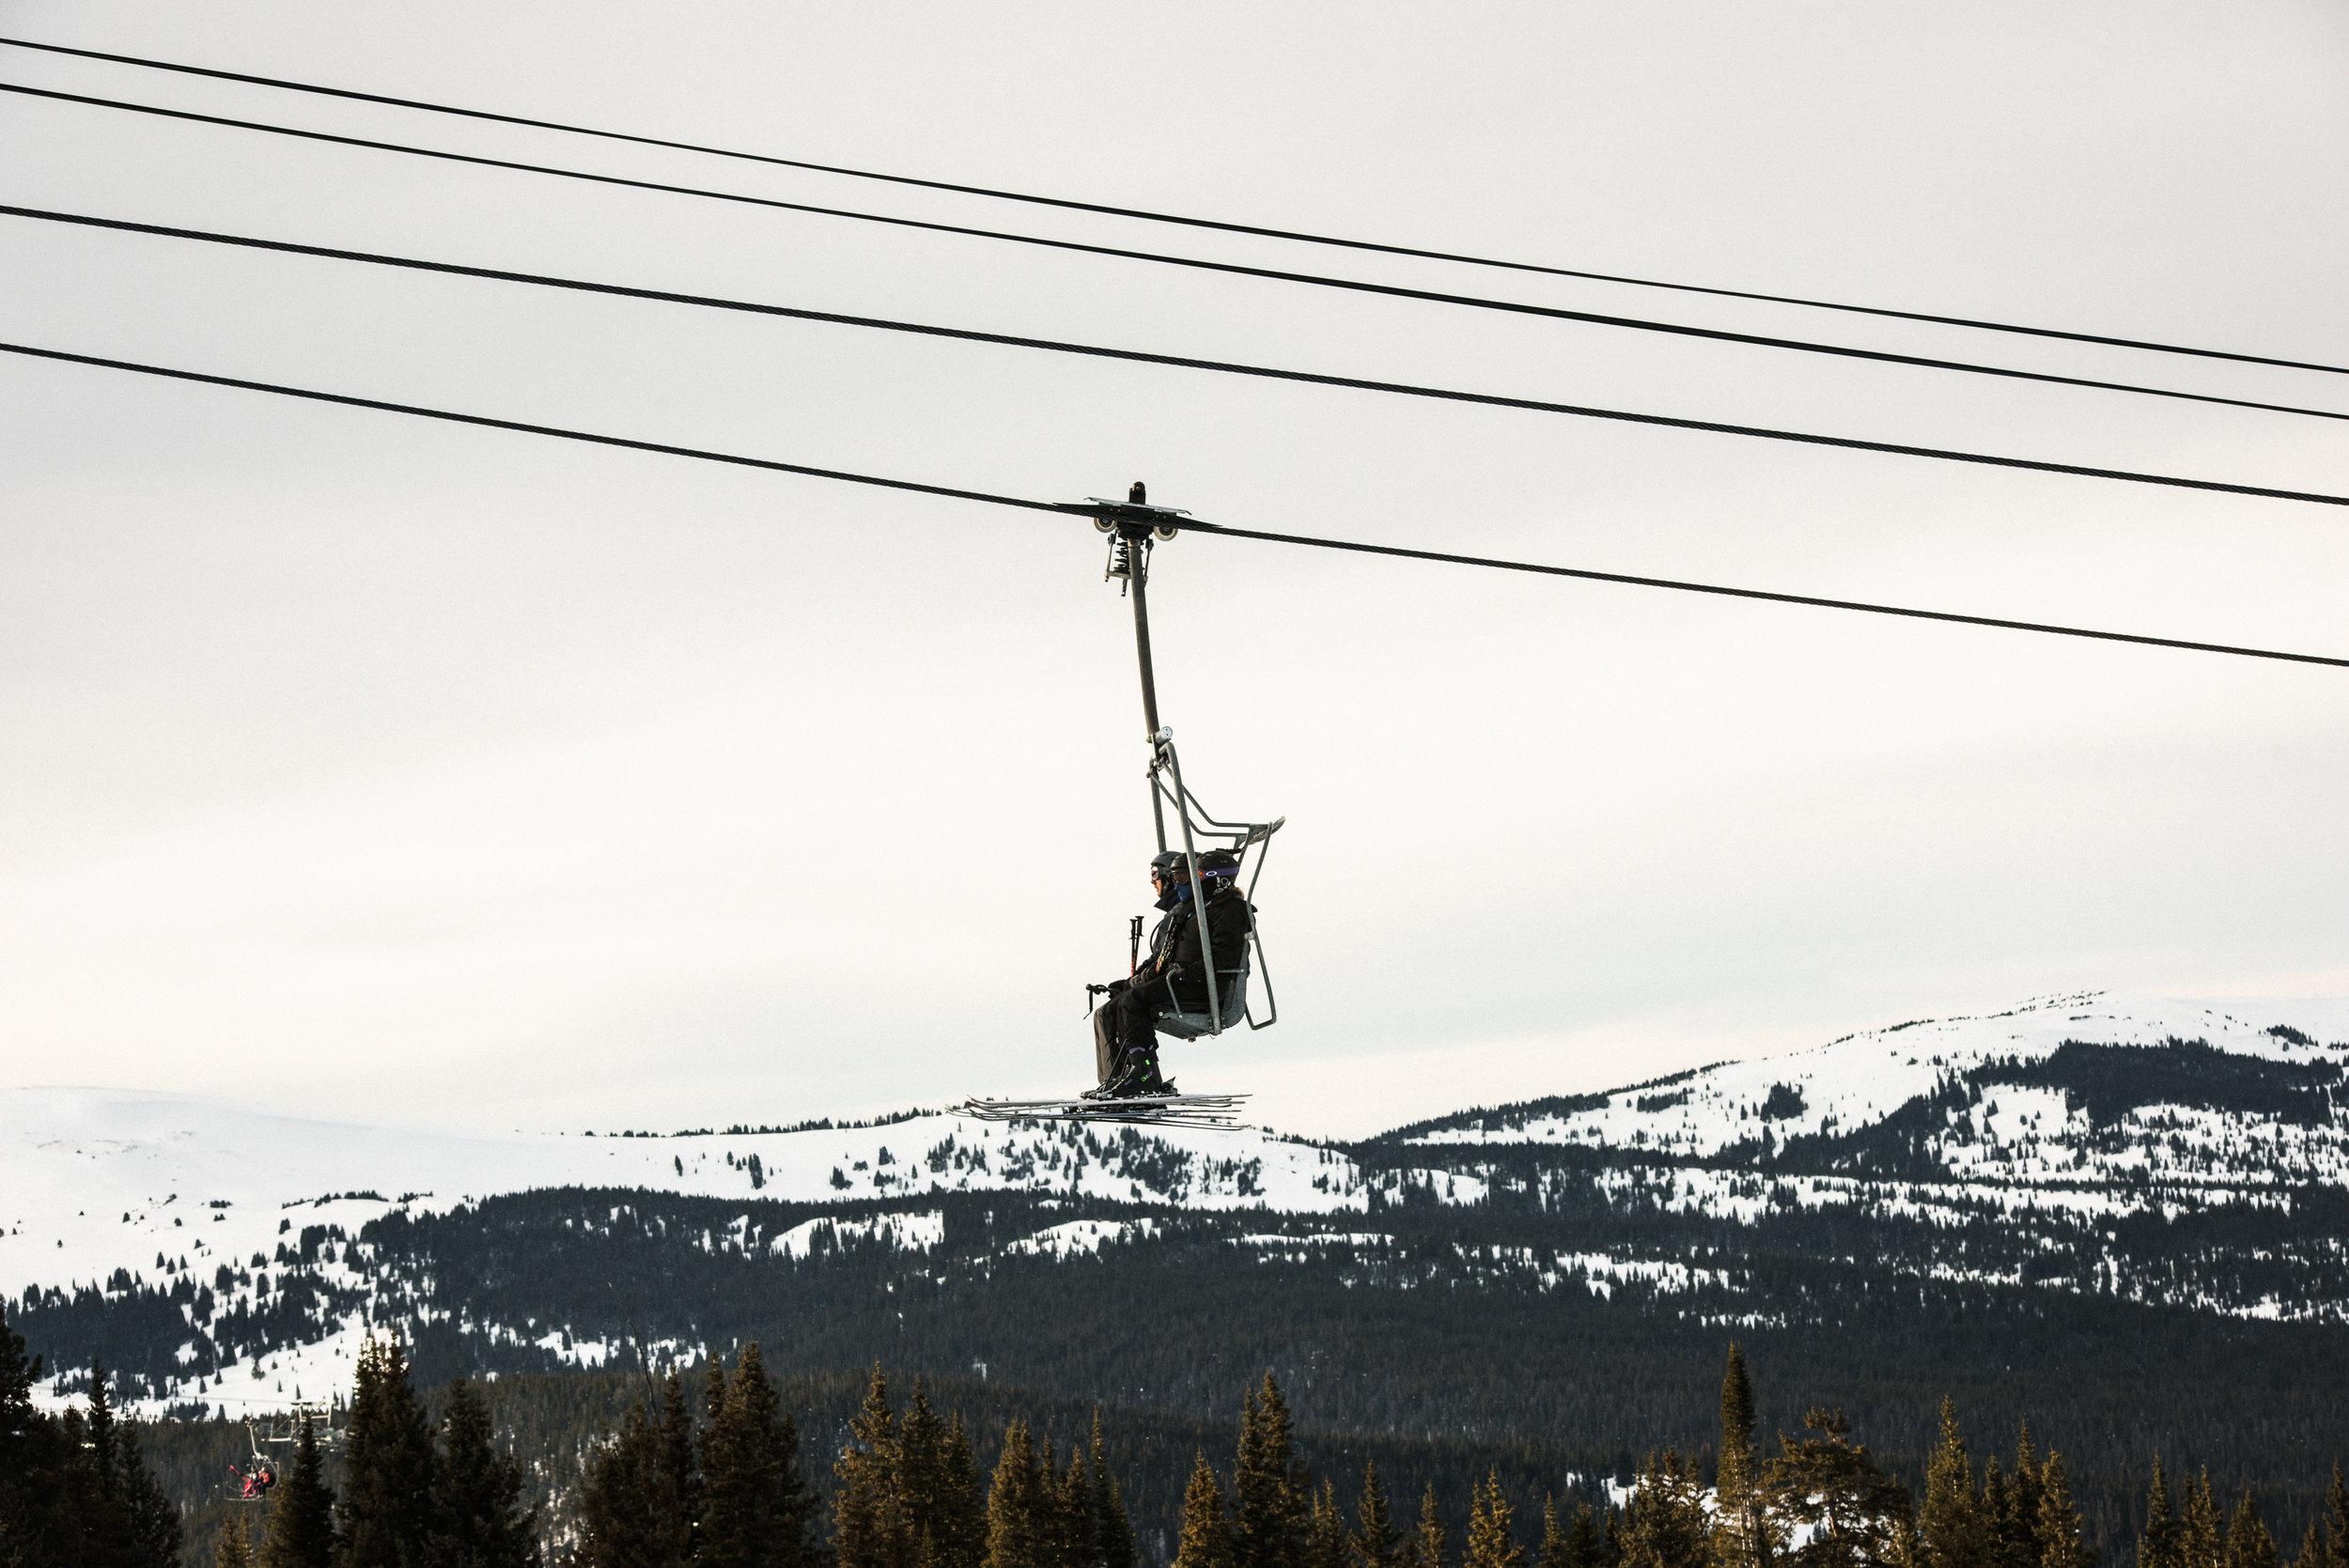 TaraShupe_Outdoor_Photographer_Loweprobags_Colorado_Copper_Mountains_Ski_67.jpg